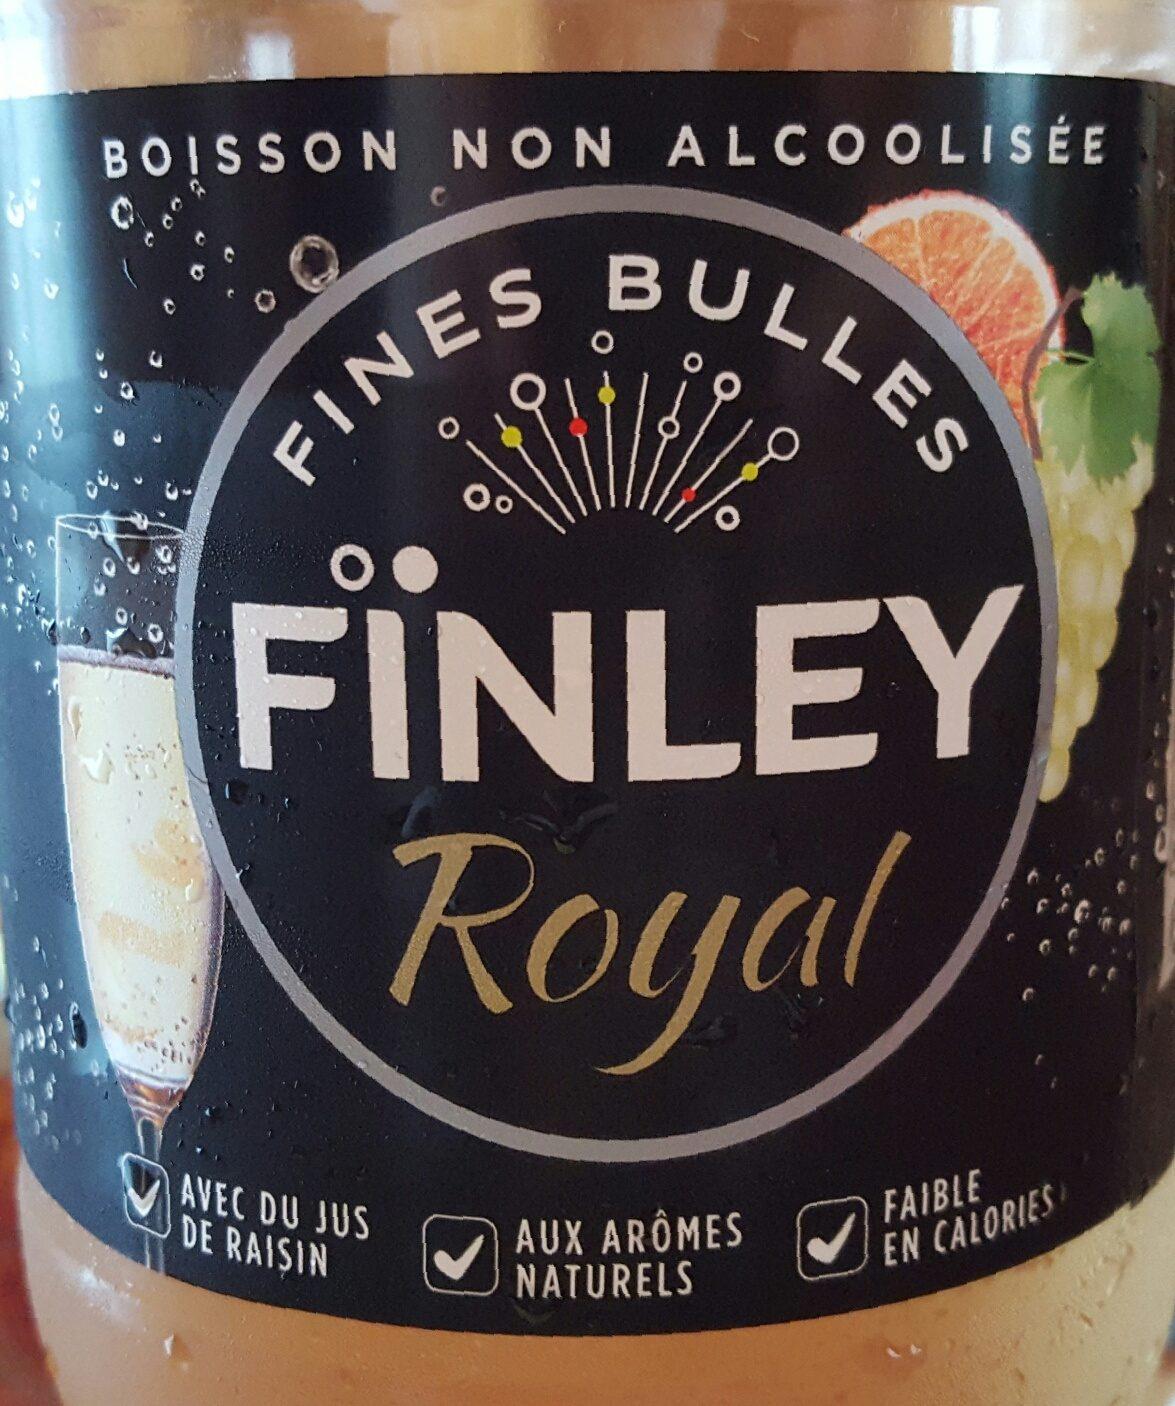 Finley royal - Product - fr